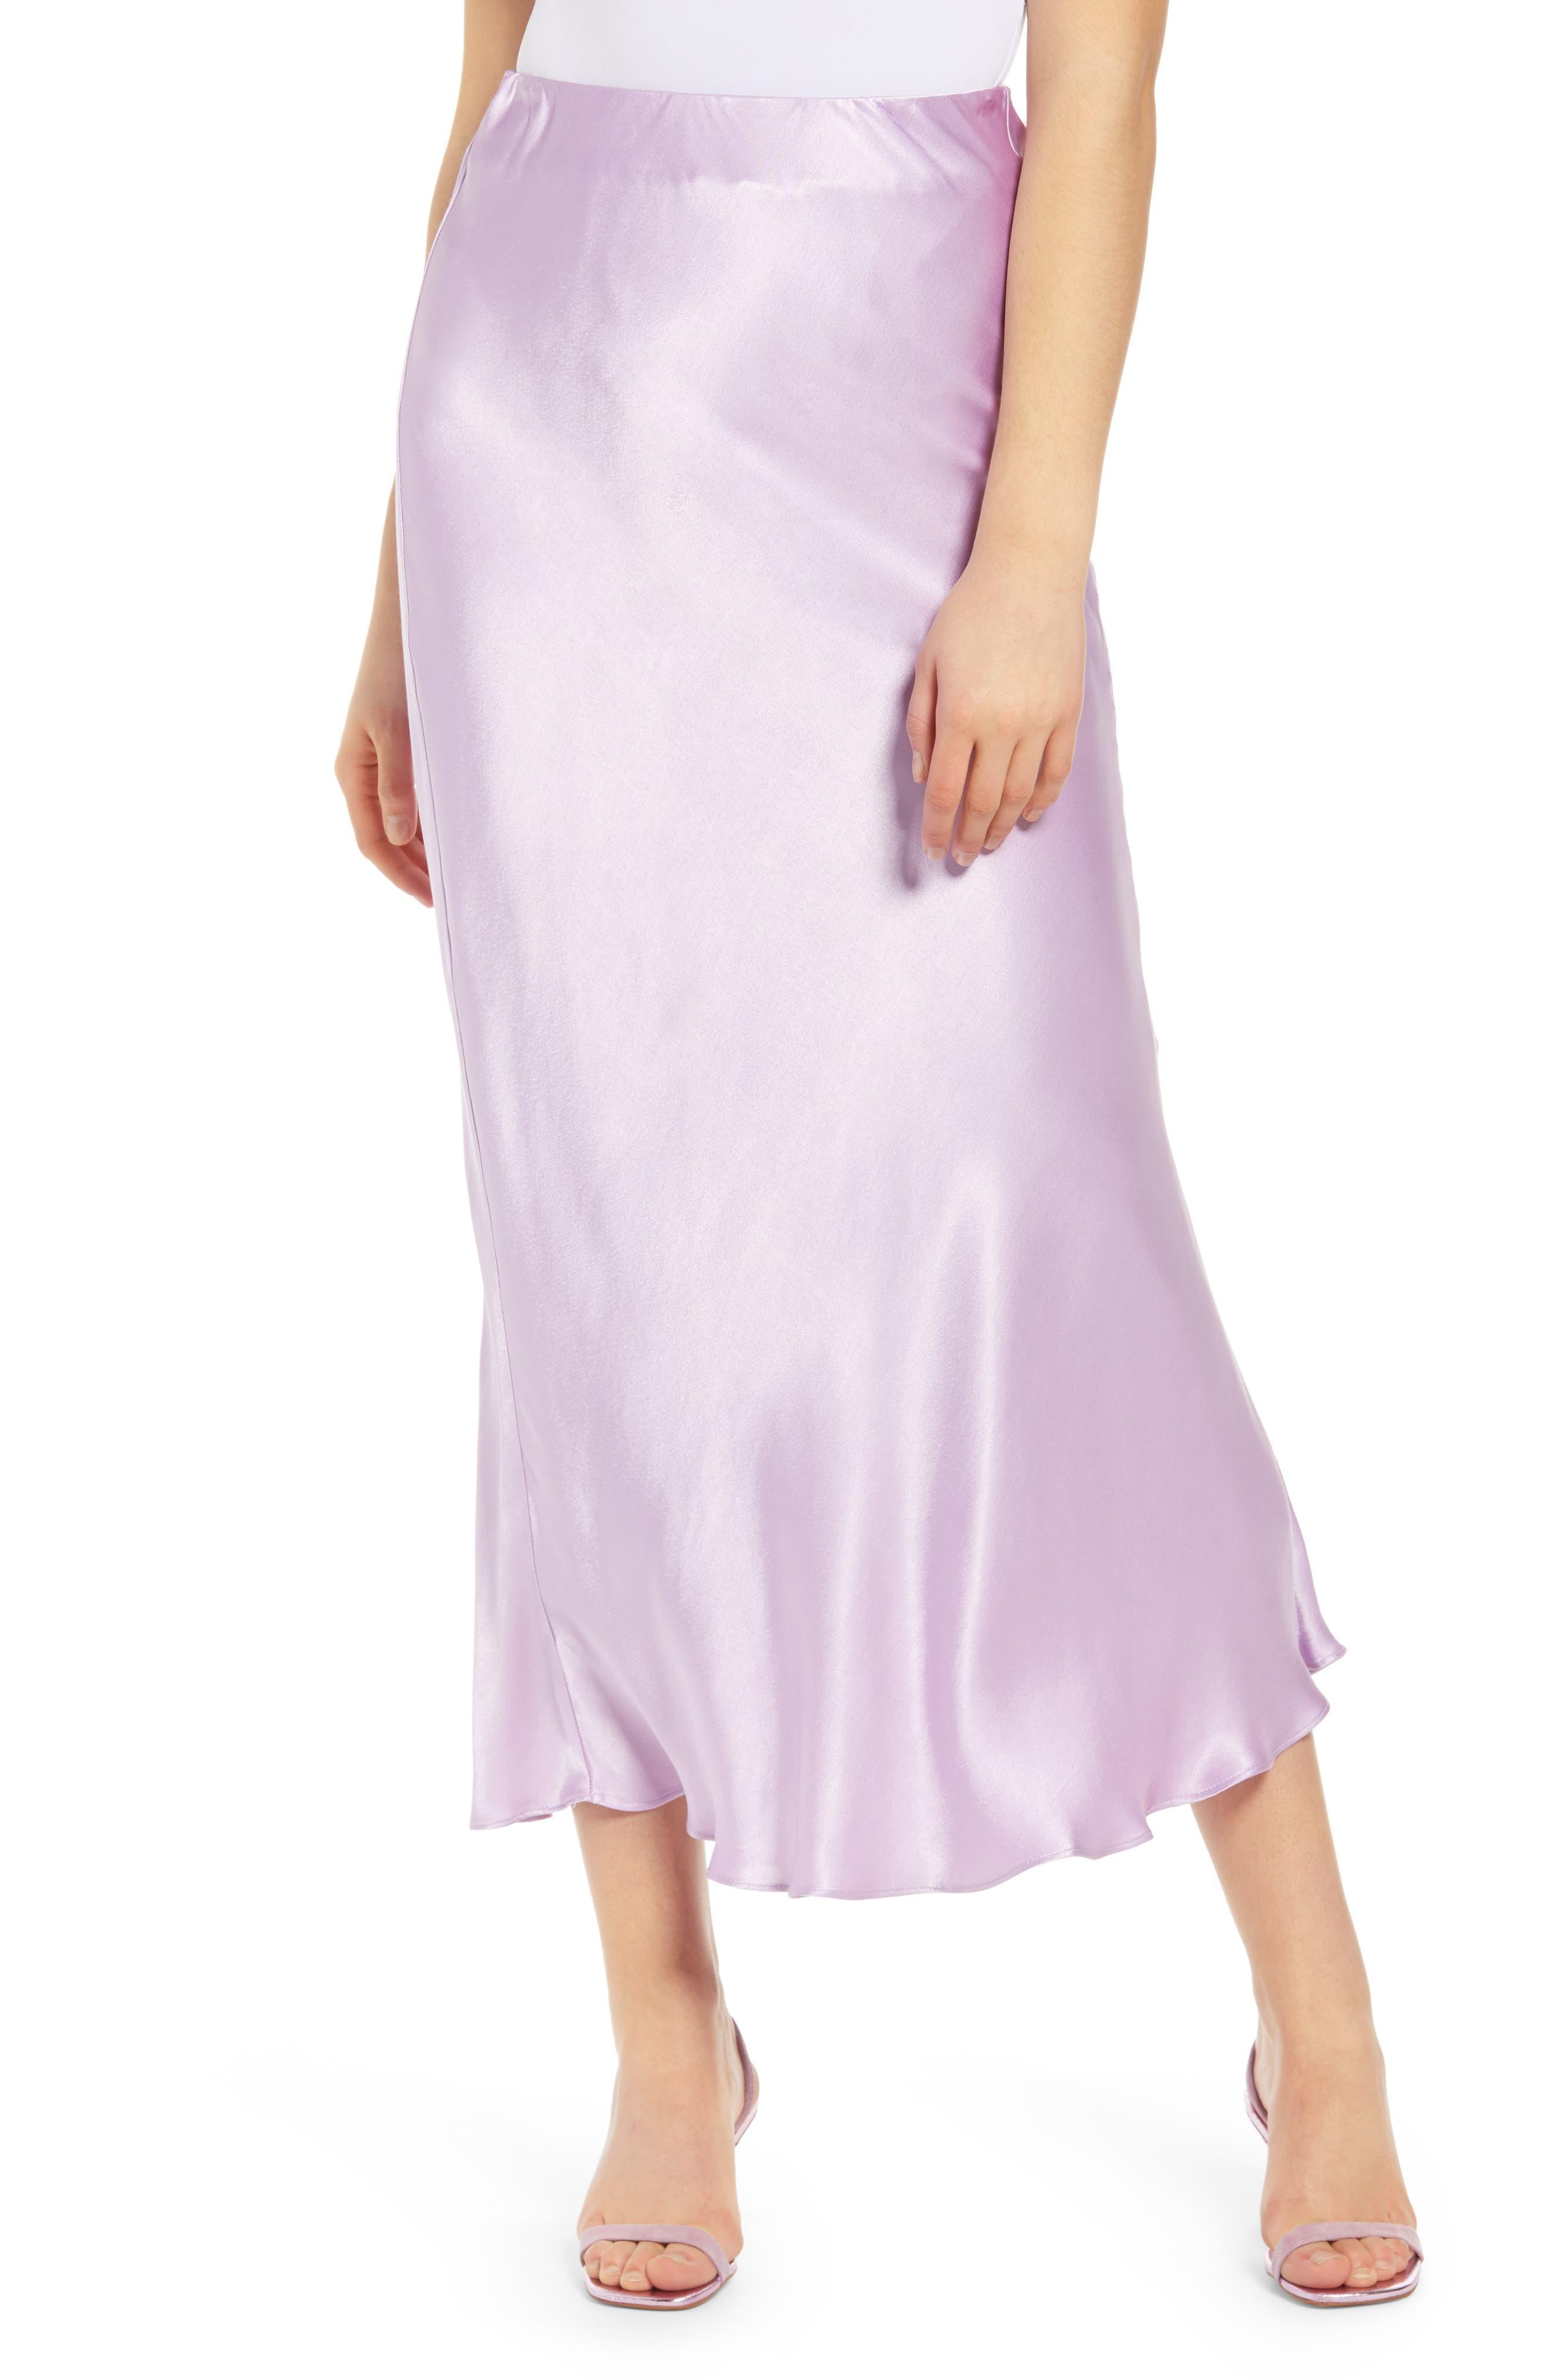 1930s Style Skirts : Midi Skirts, Tea Length, Pleated Womens Grey Lab Bias Cut Satin Skirt Size Small - Purple $80.00 AT vintagedancer.com